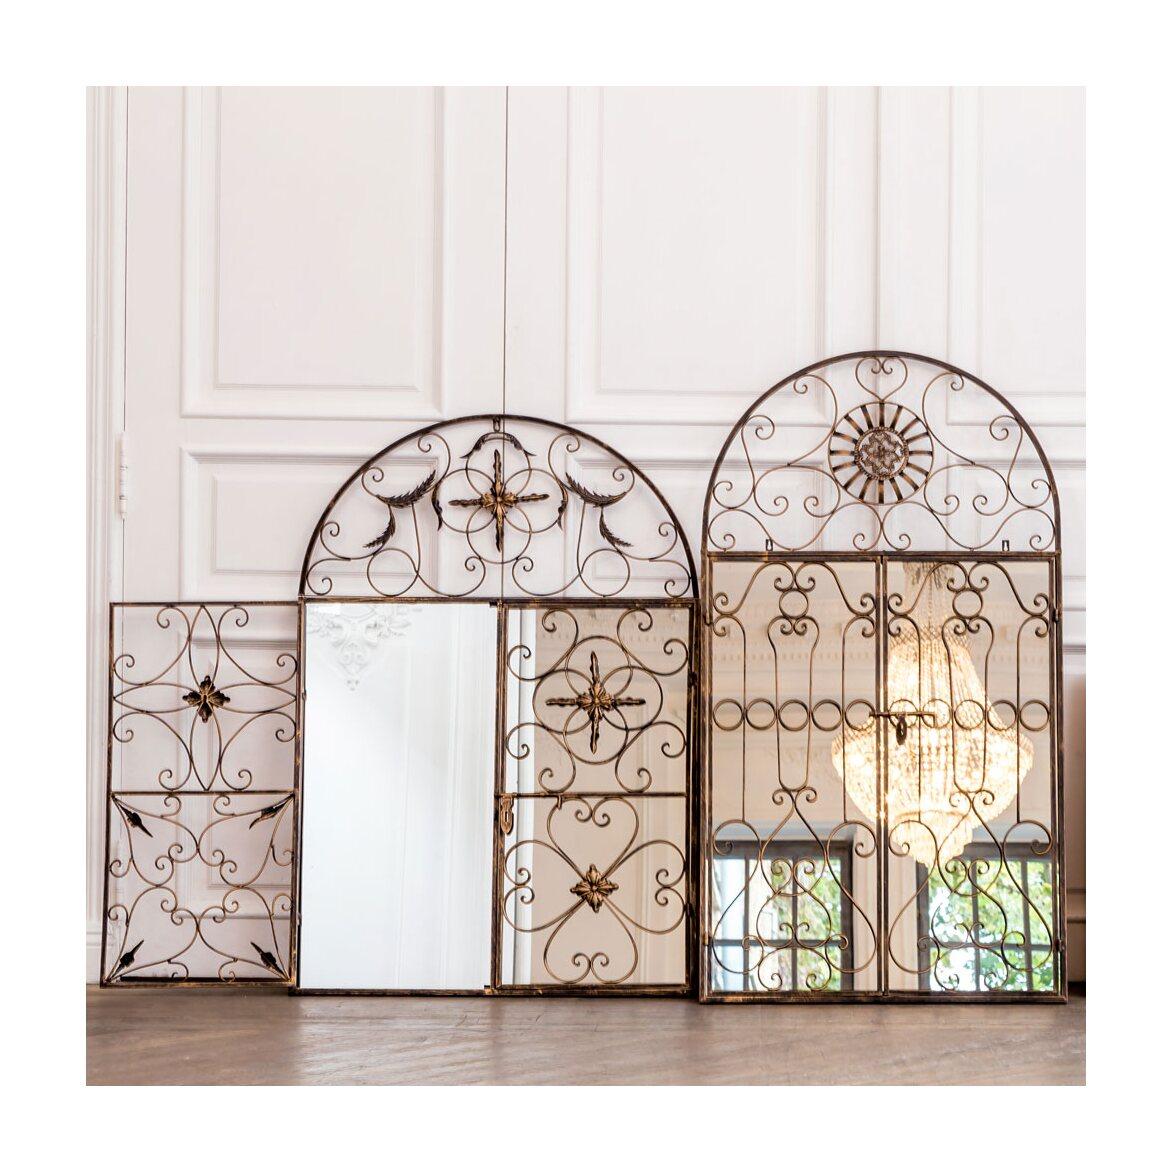 Настенное зеркало «Дивон» (королевская бронза) 4 | Настенные зеркала Kingsby